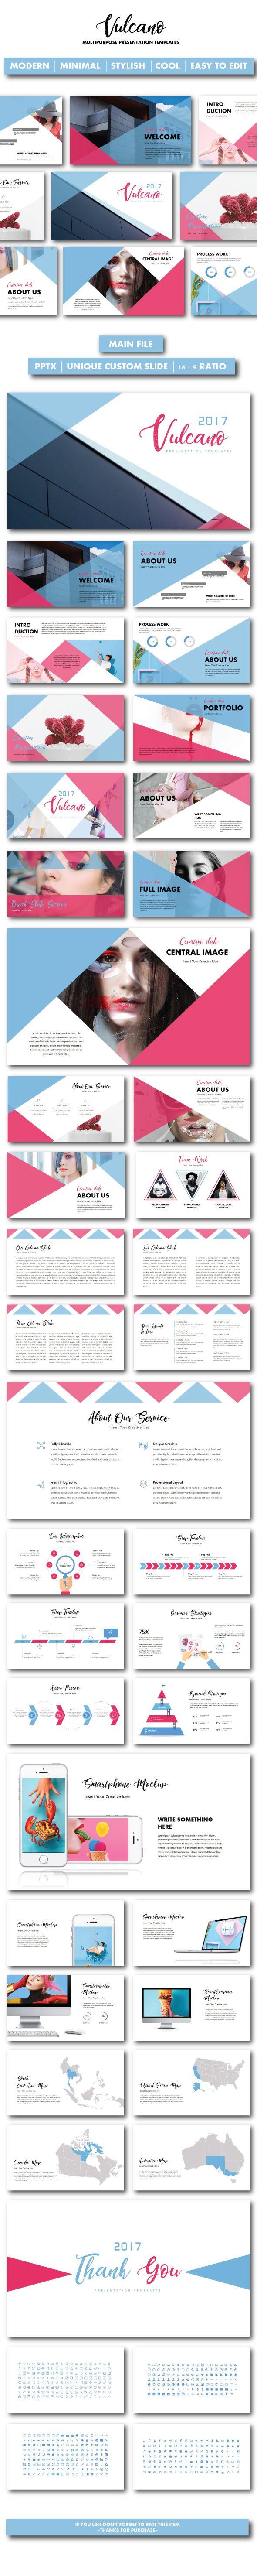 Vulcano Creative Presentation Templates - PowerPoint Templates Presentation Templates